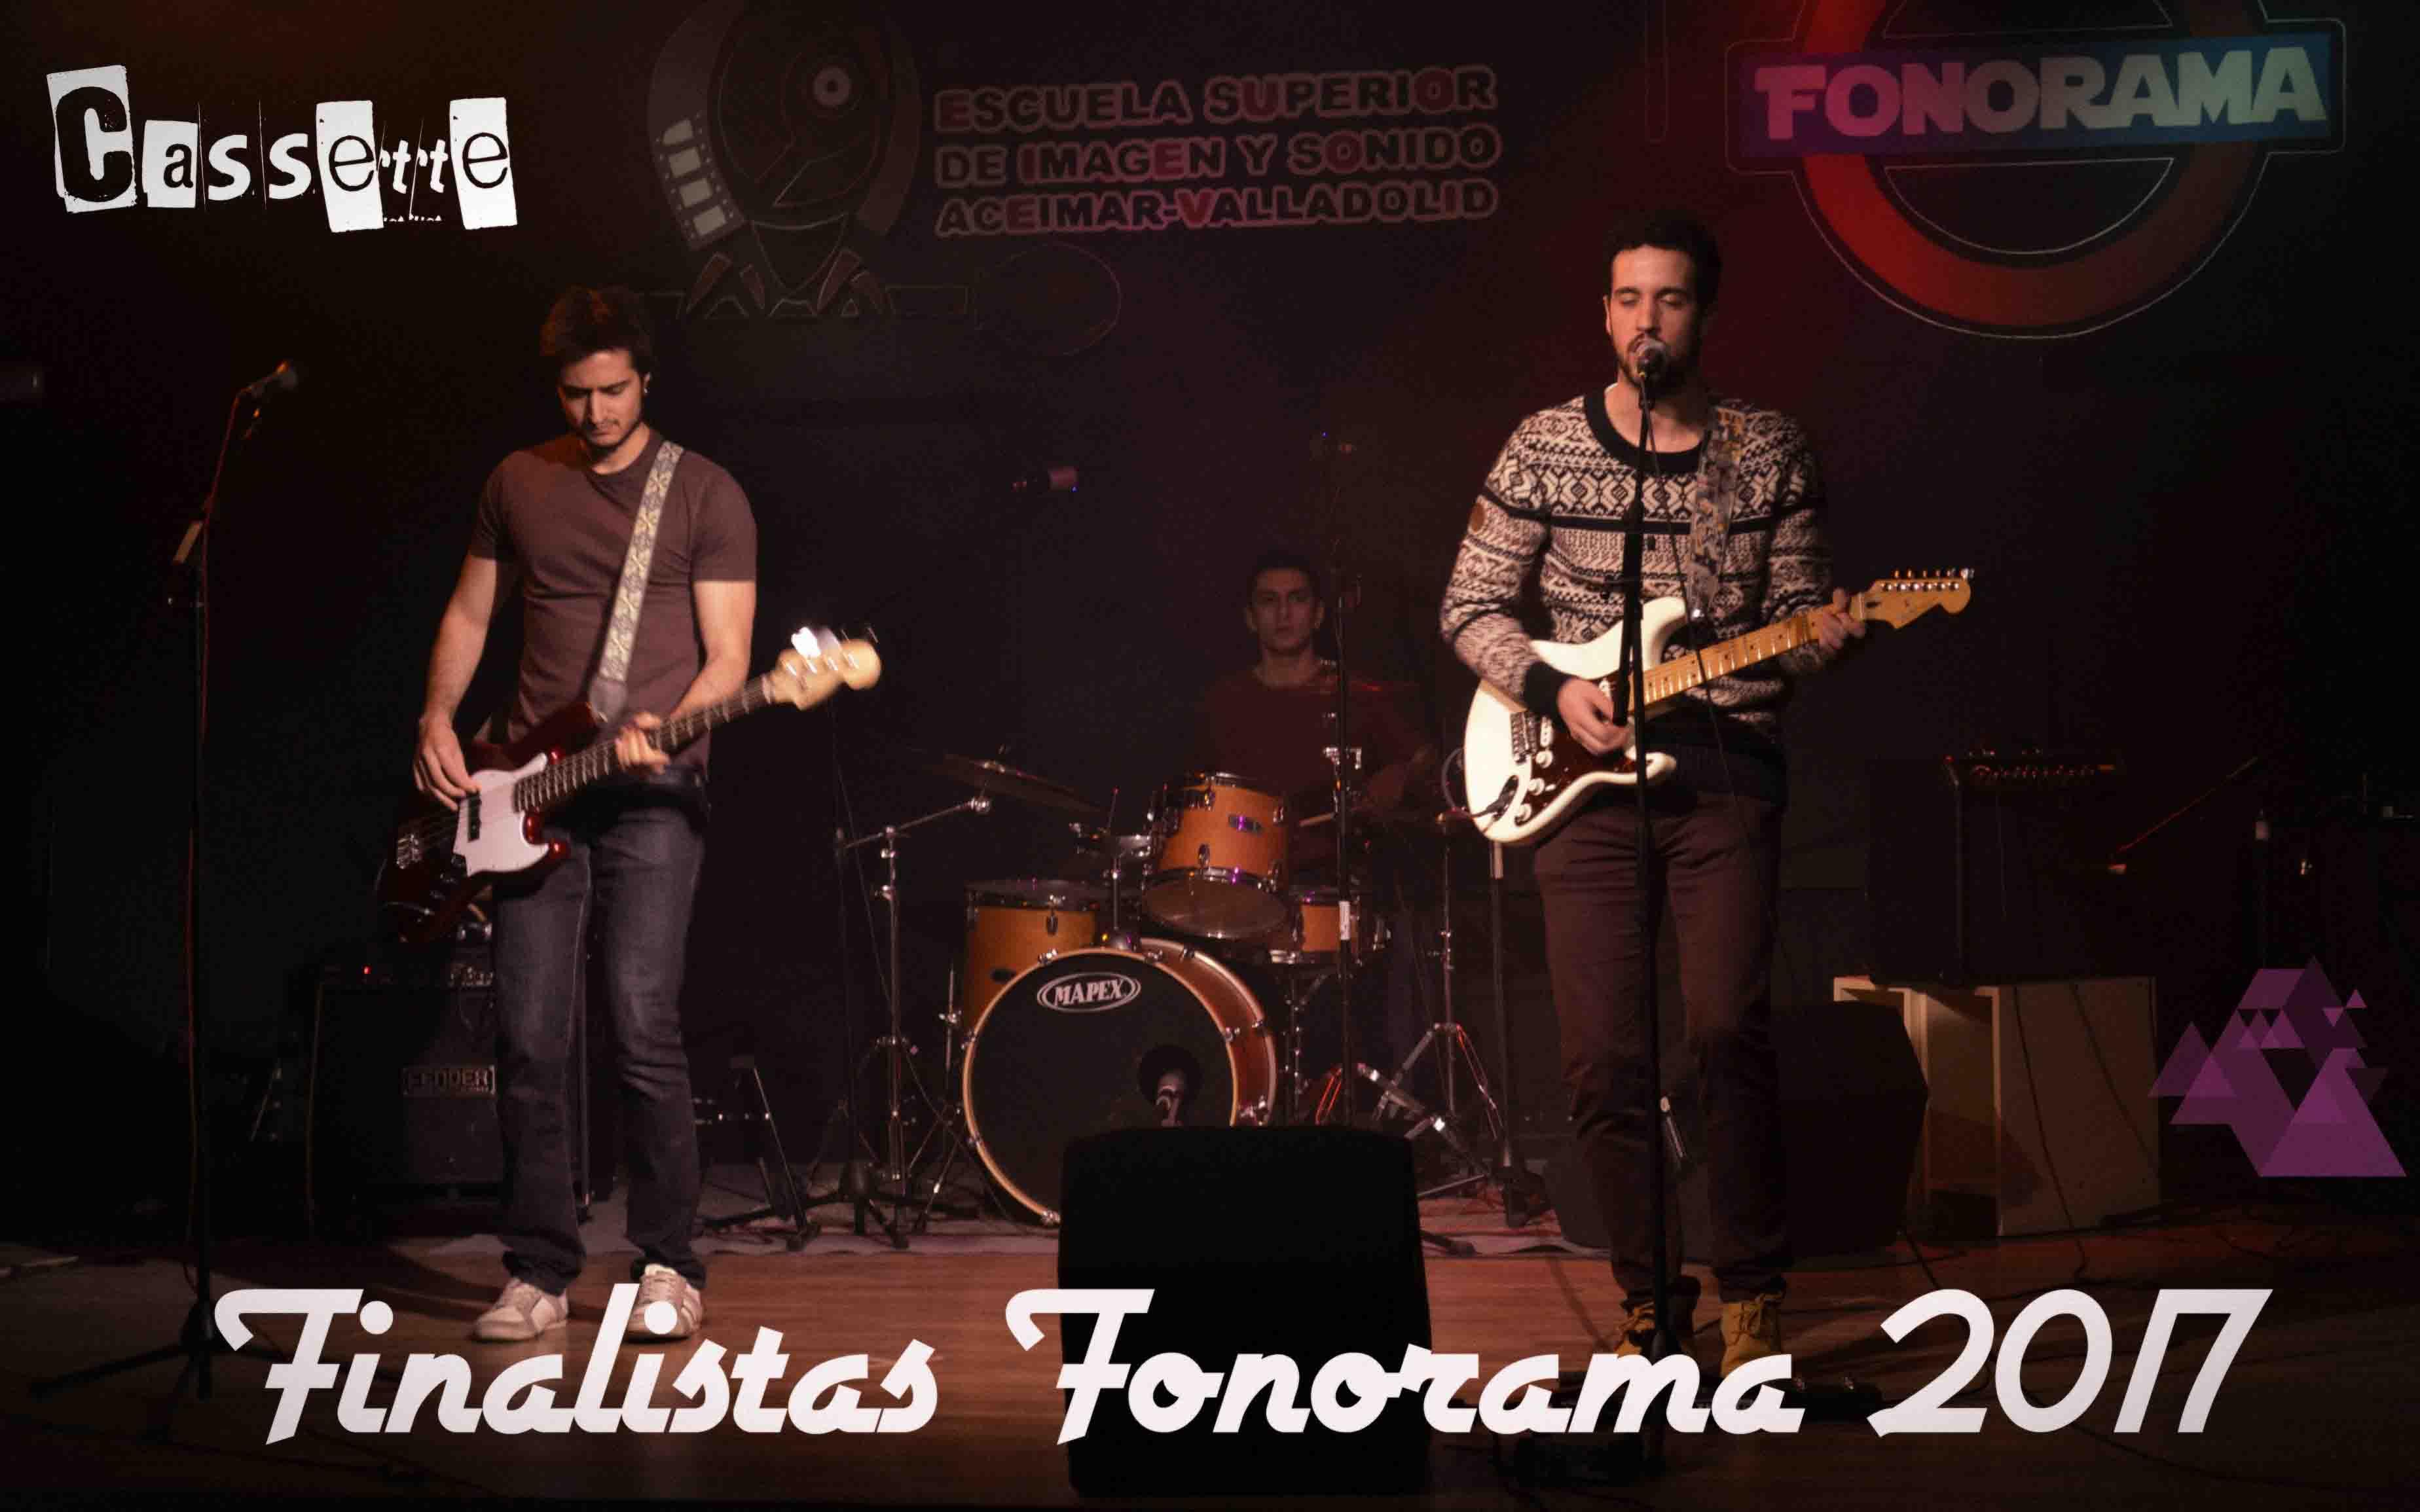 cassette-ganador-fonorama-esisv